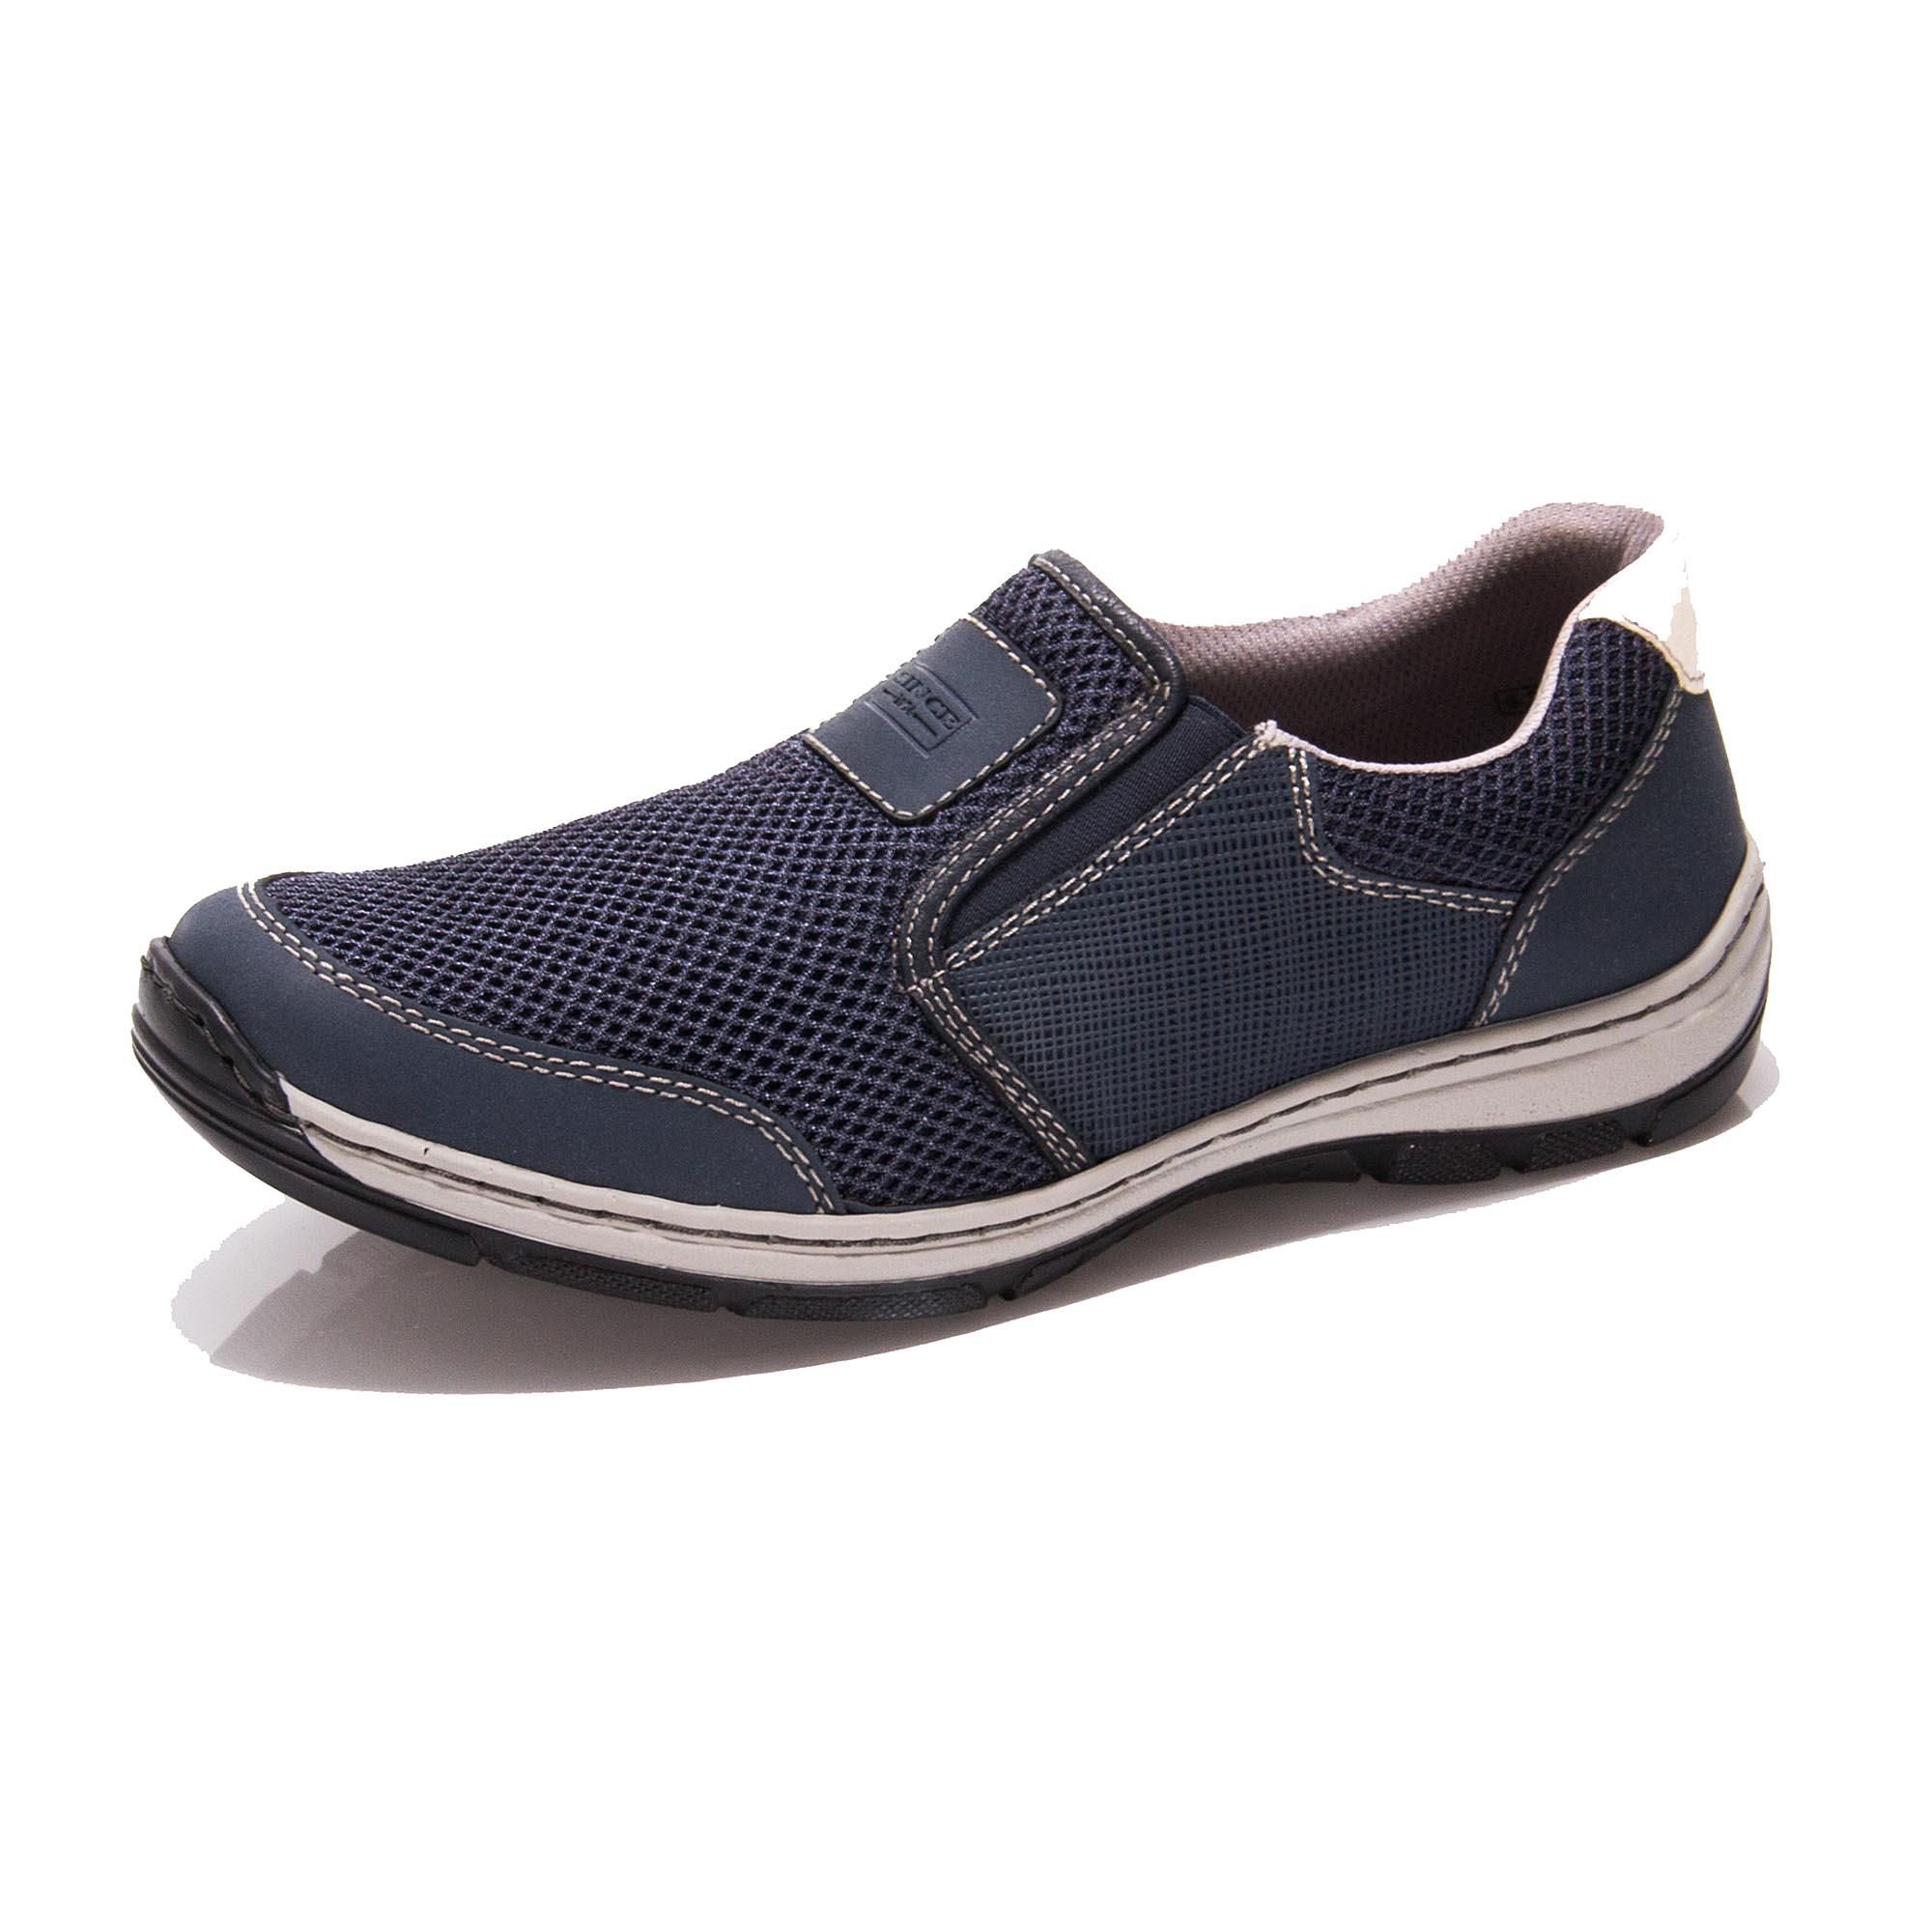 098e46ca3d detail Pánska obuv RIEKER 15253-14 BLAU F S 9